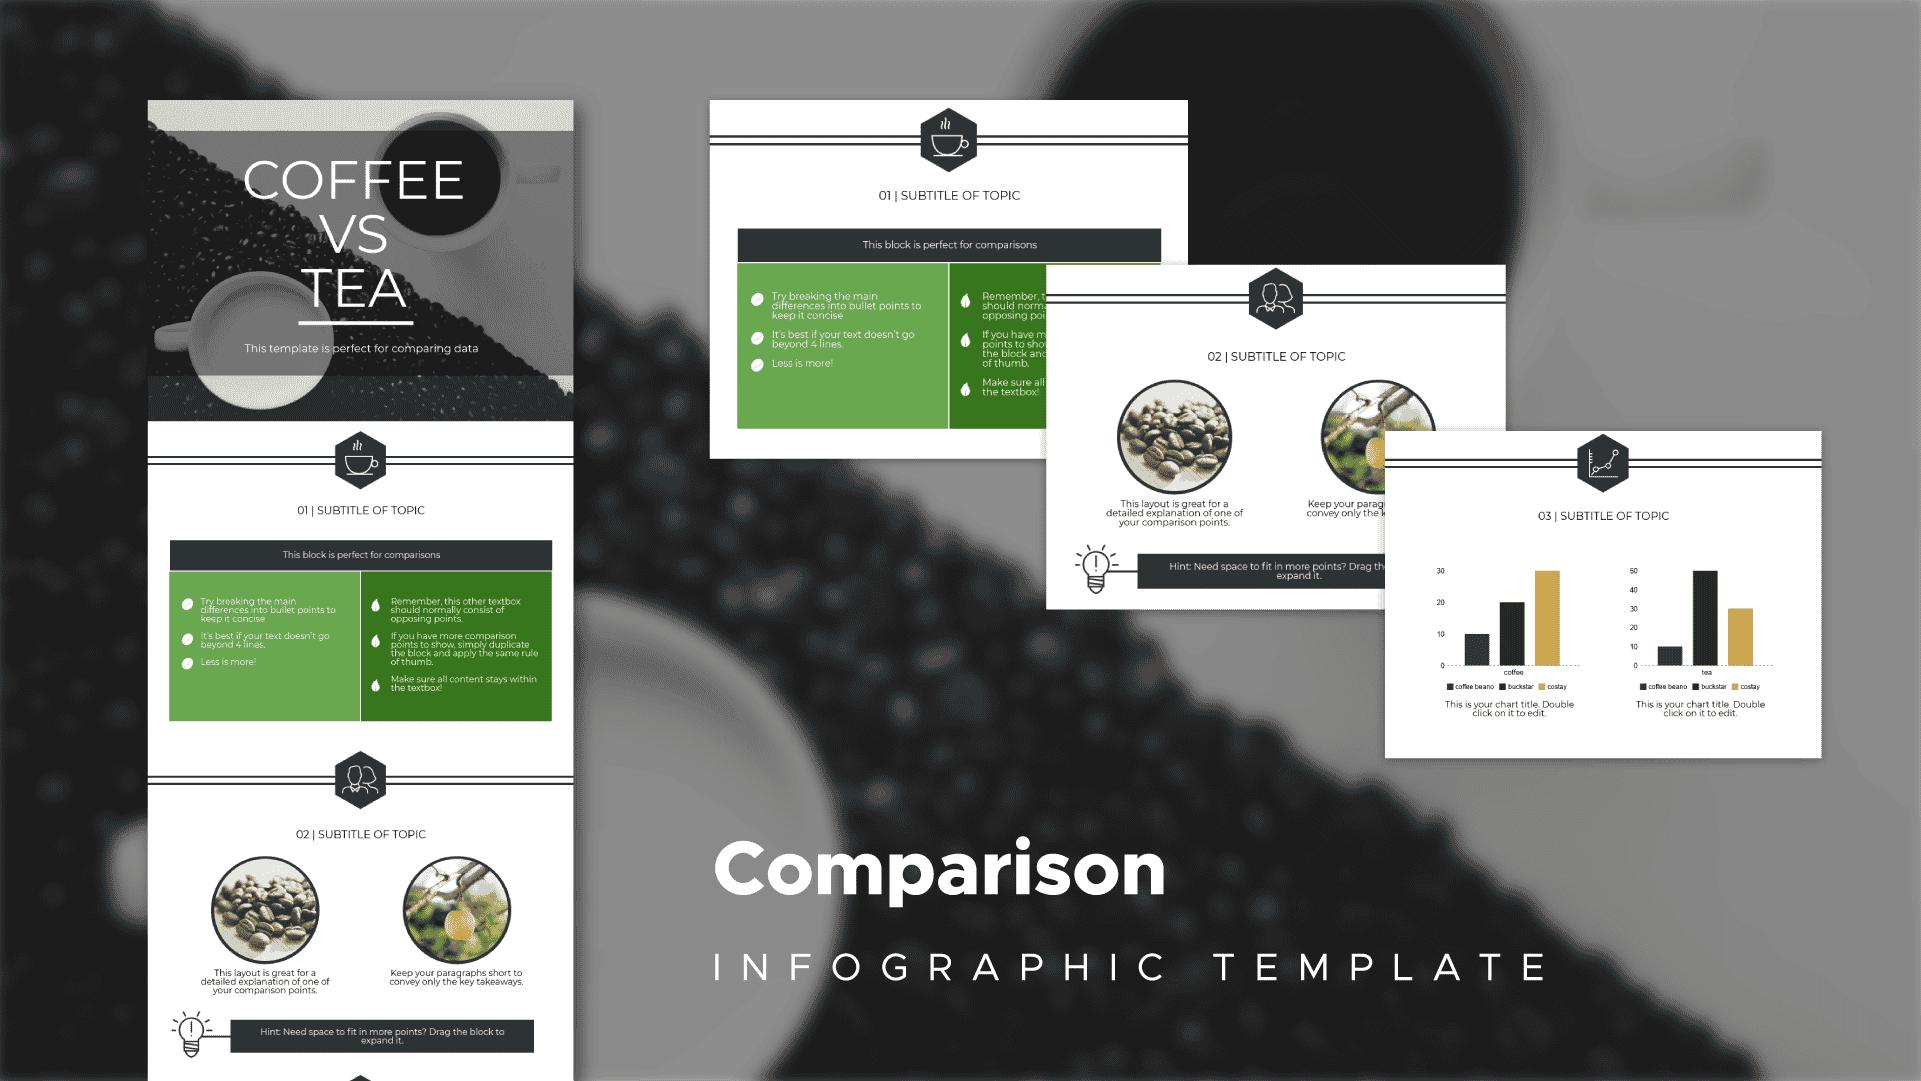 coffee vs tea, comparative infographic